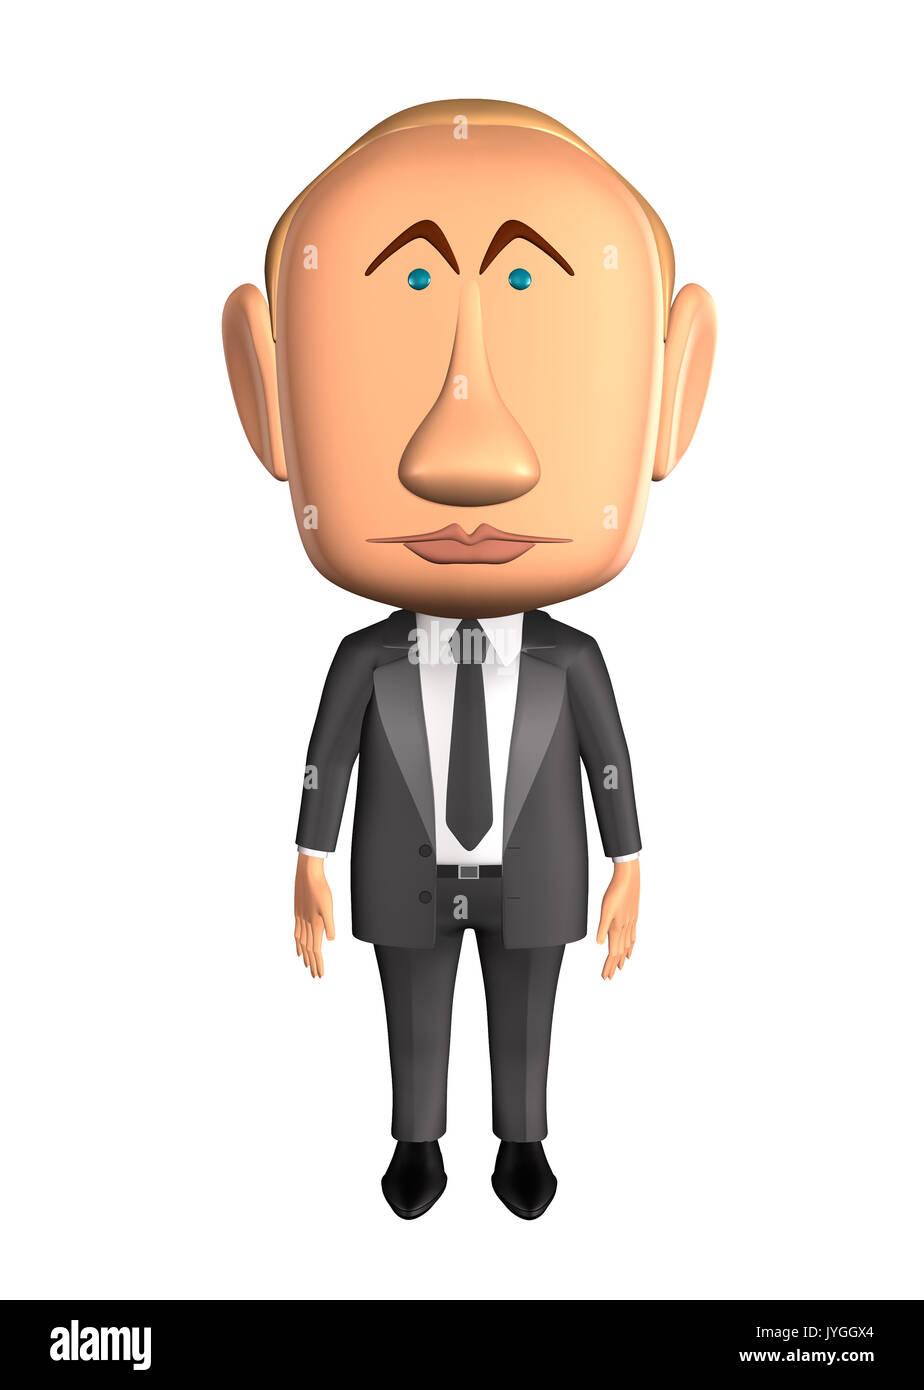 Vladimir Putin standing - Stock Image